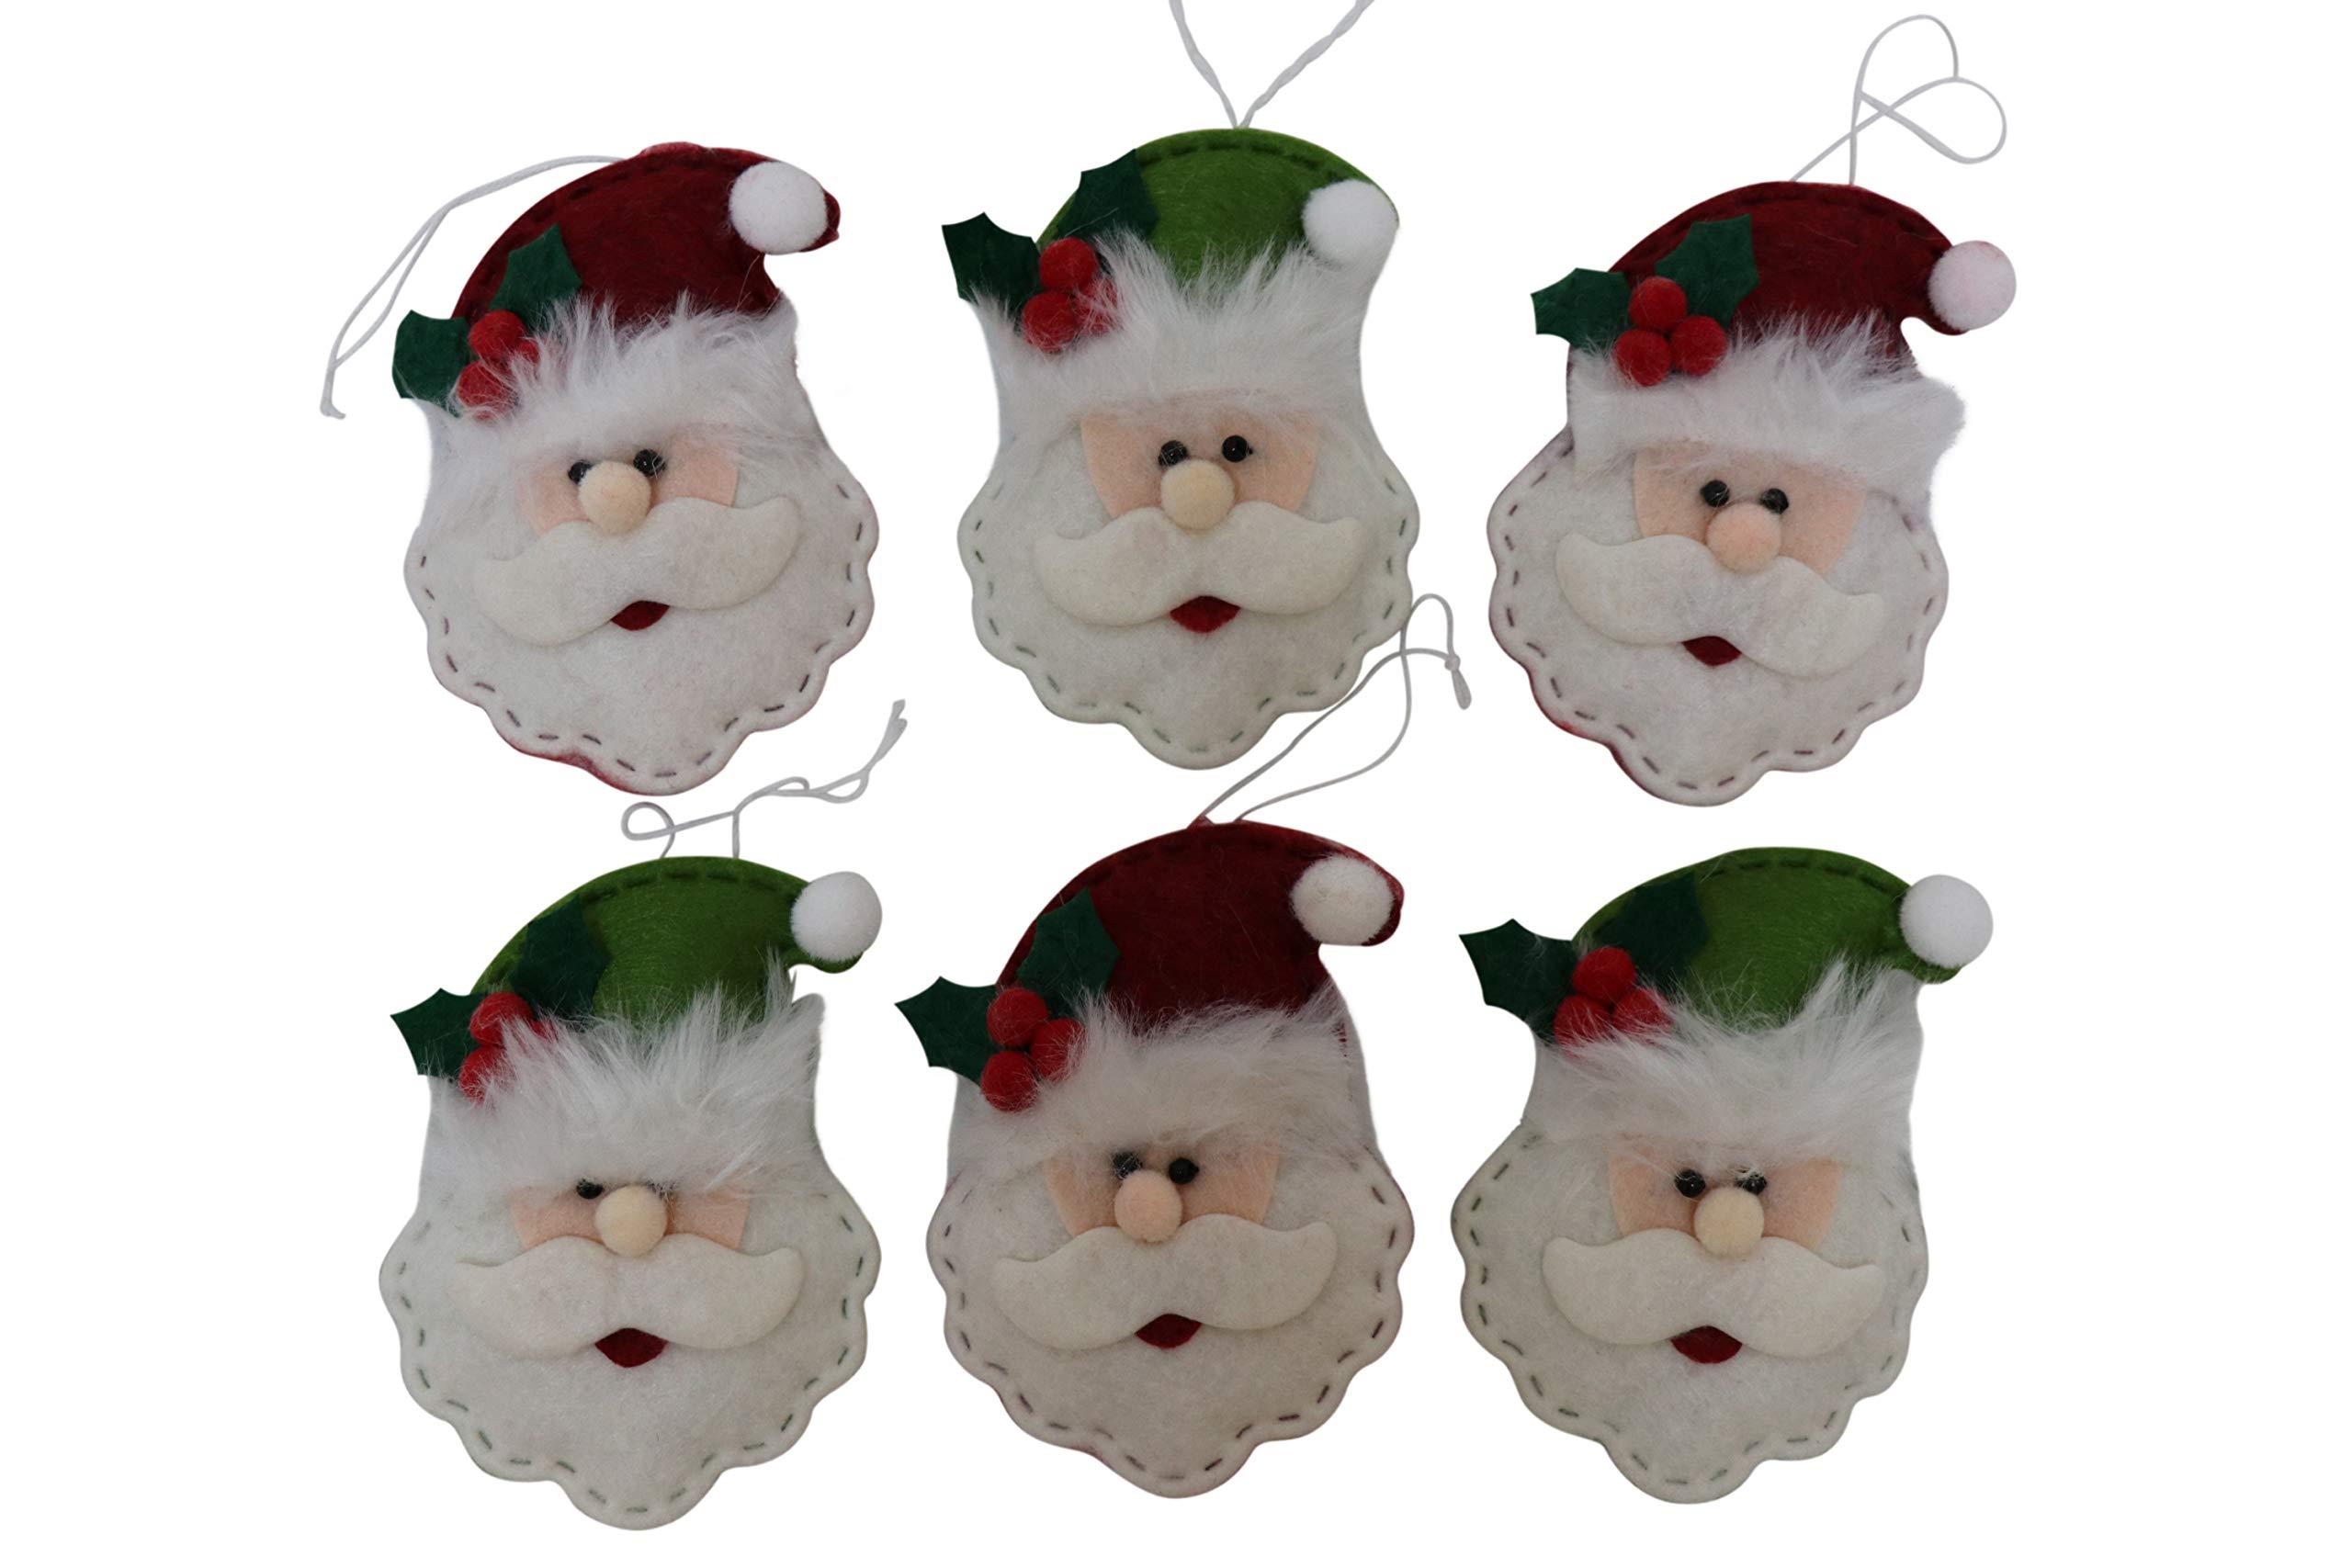 Image of Set of 6 Felt Santa Claus Christmas Ornaments